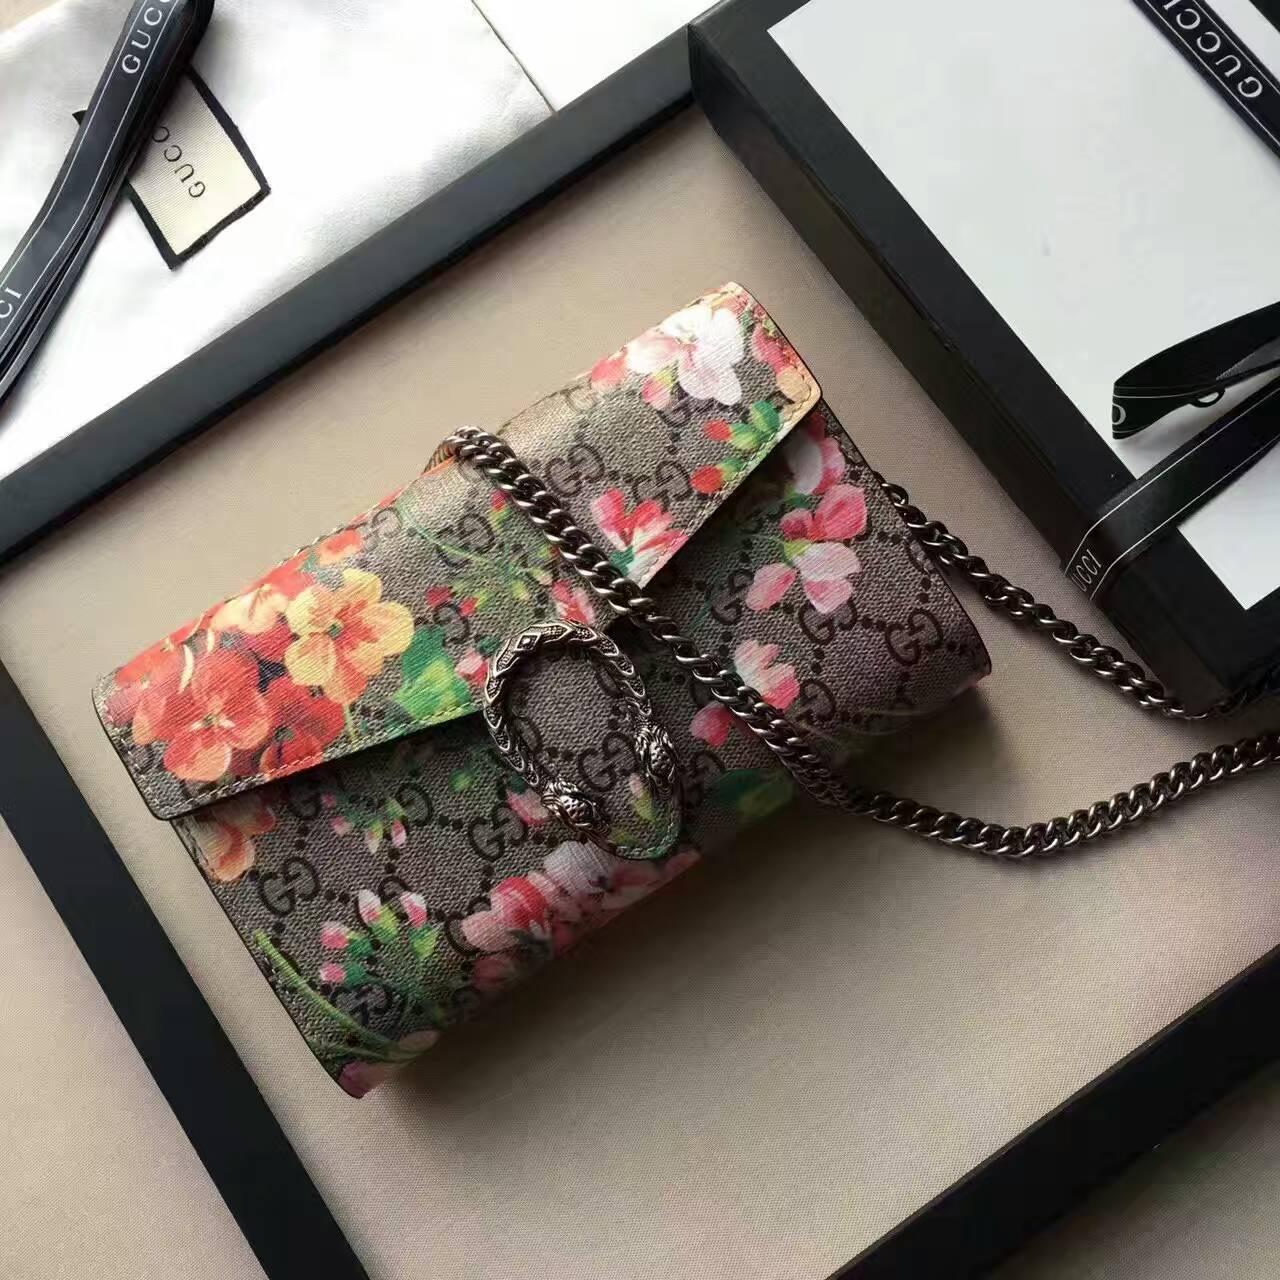 94c9676d67f1 Gucci Dionysus Blooms Print Mini Chain Bag 401231 | Stanford Center ...